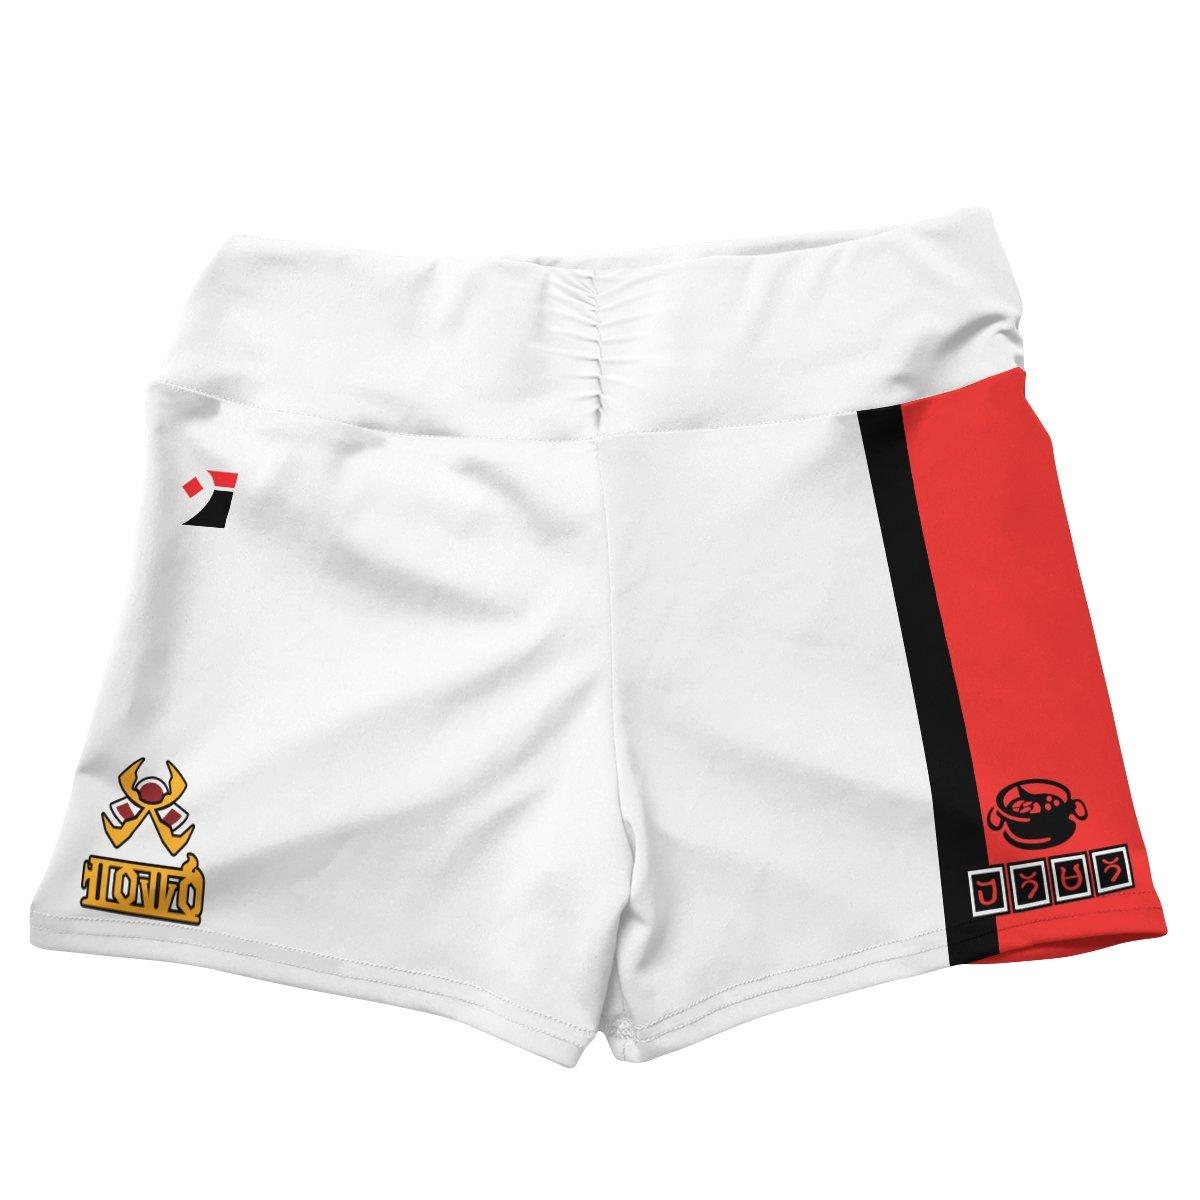 pokemon fire uniform active wear set 282233 - Anime Swimsuits